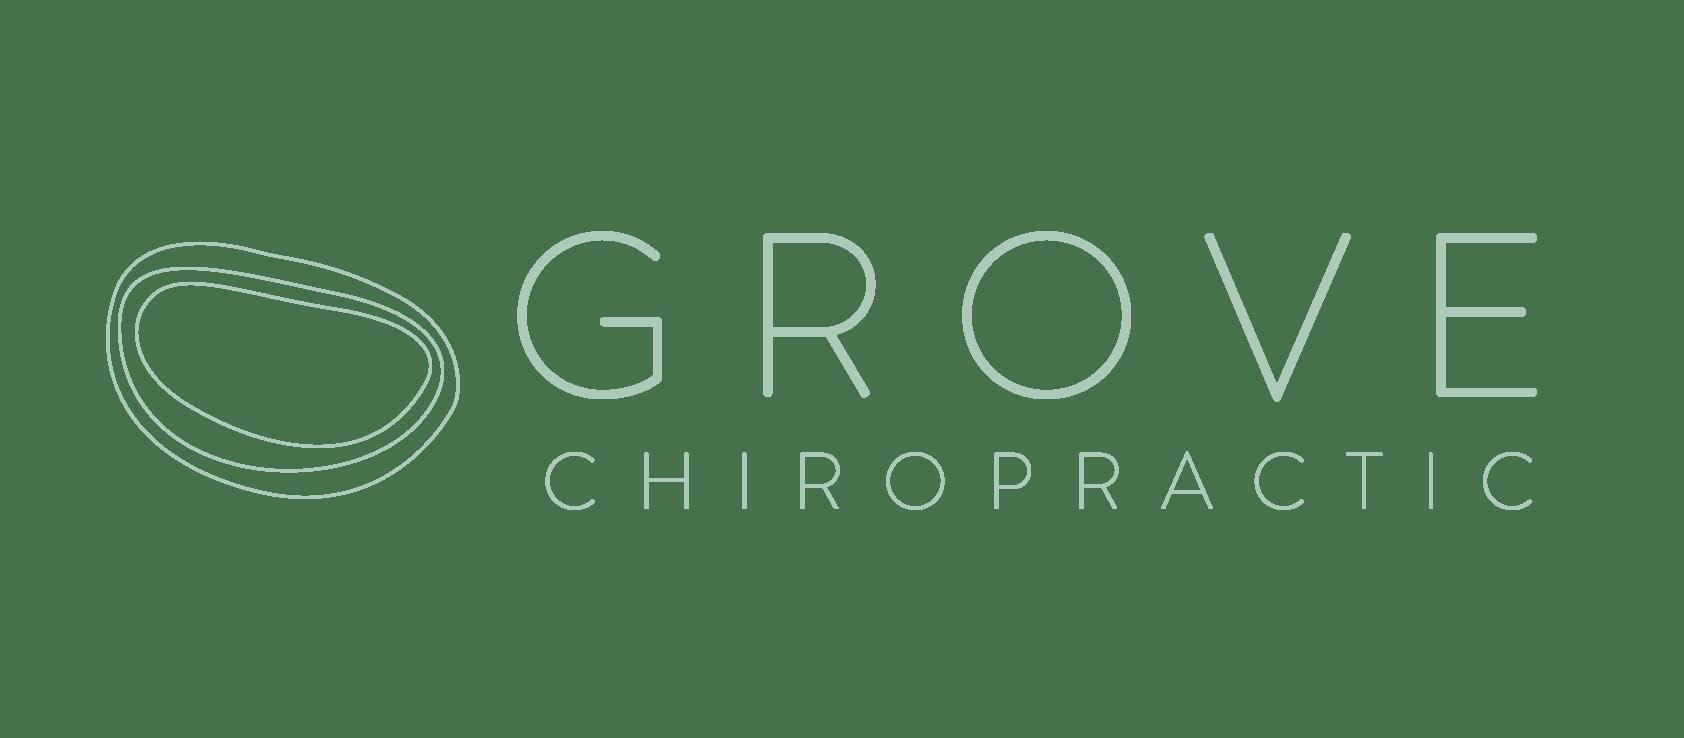 Grove Chiropractic